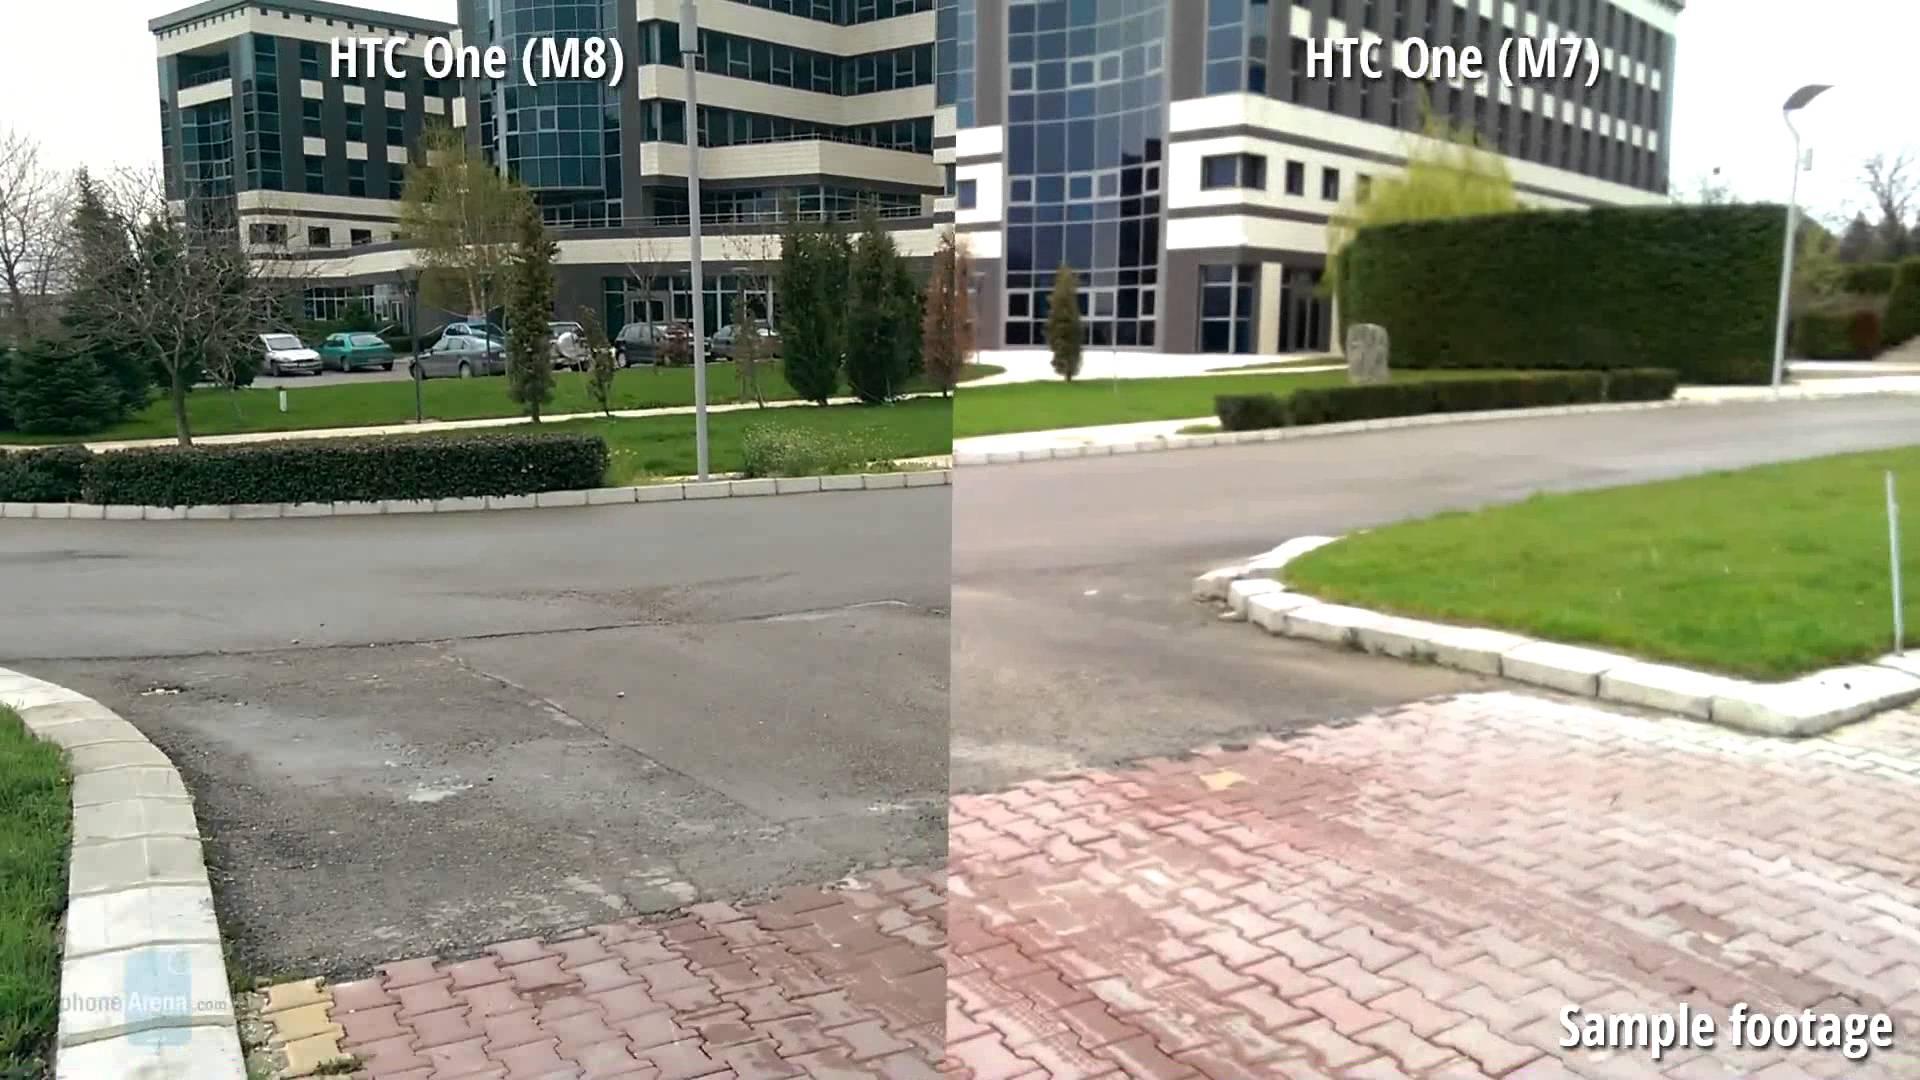 HTC One M7 vs HTC One M8 - specs, price, design compared